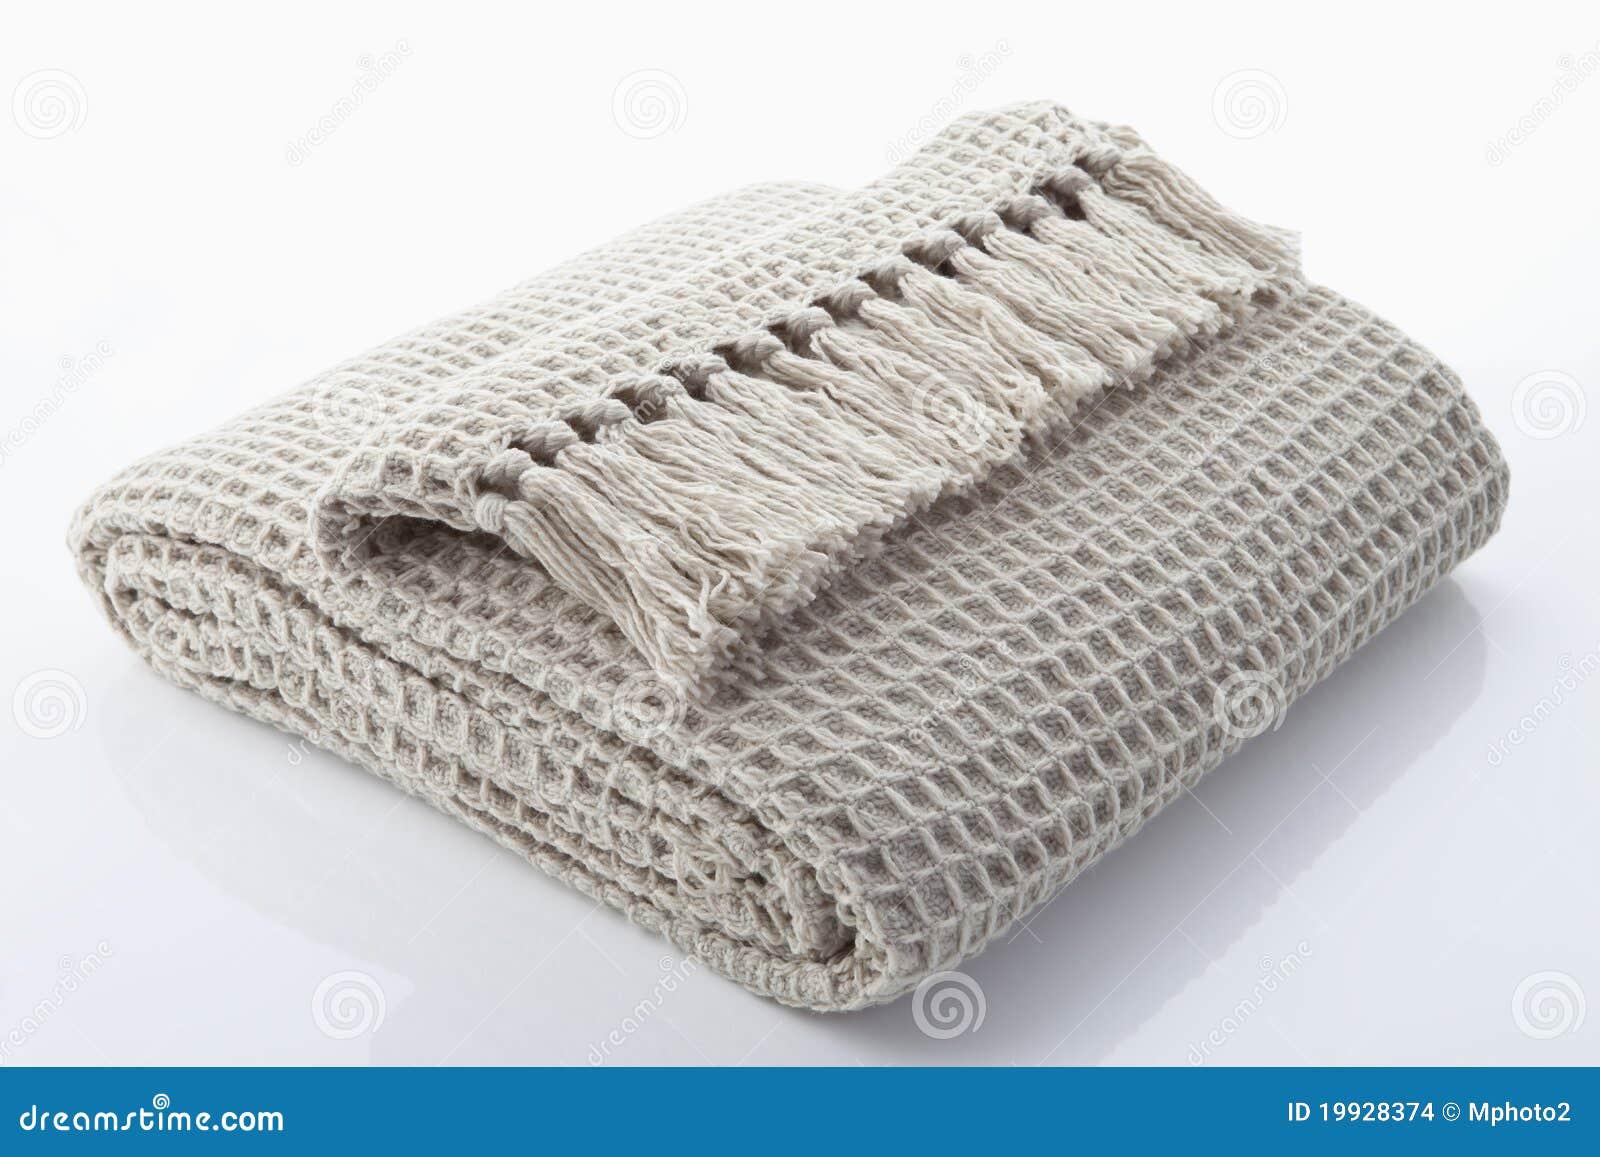 coperta di lana immagini stock immagine 19928374